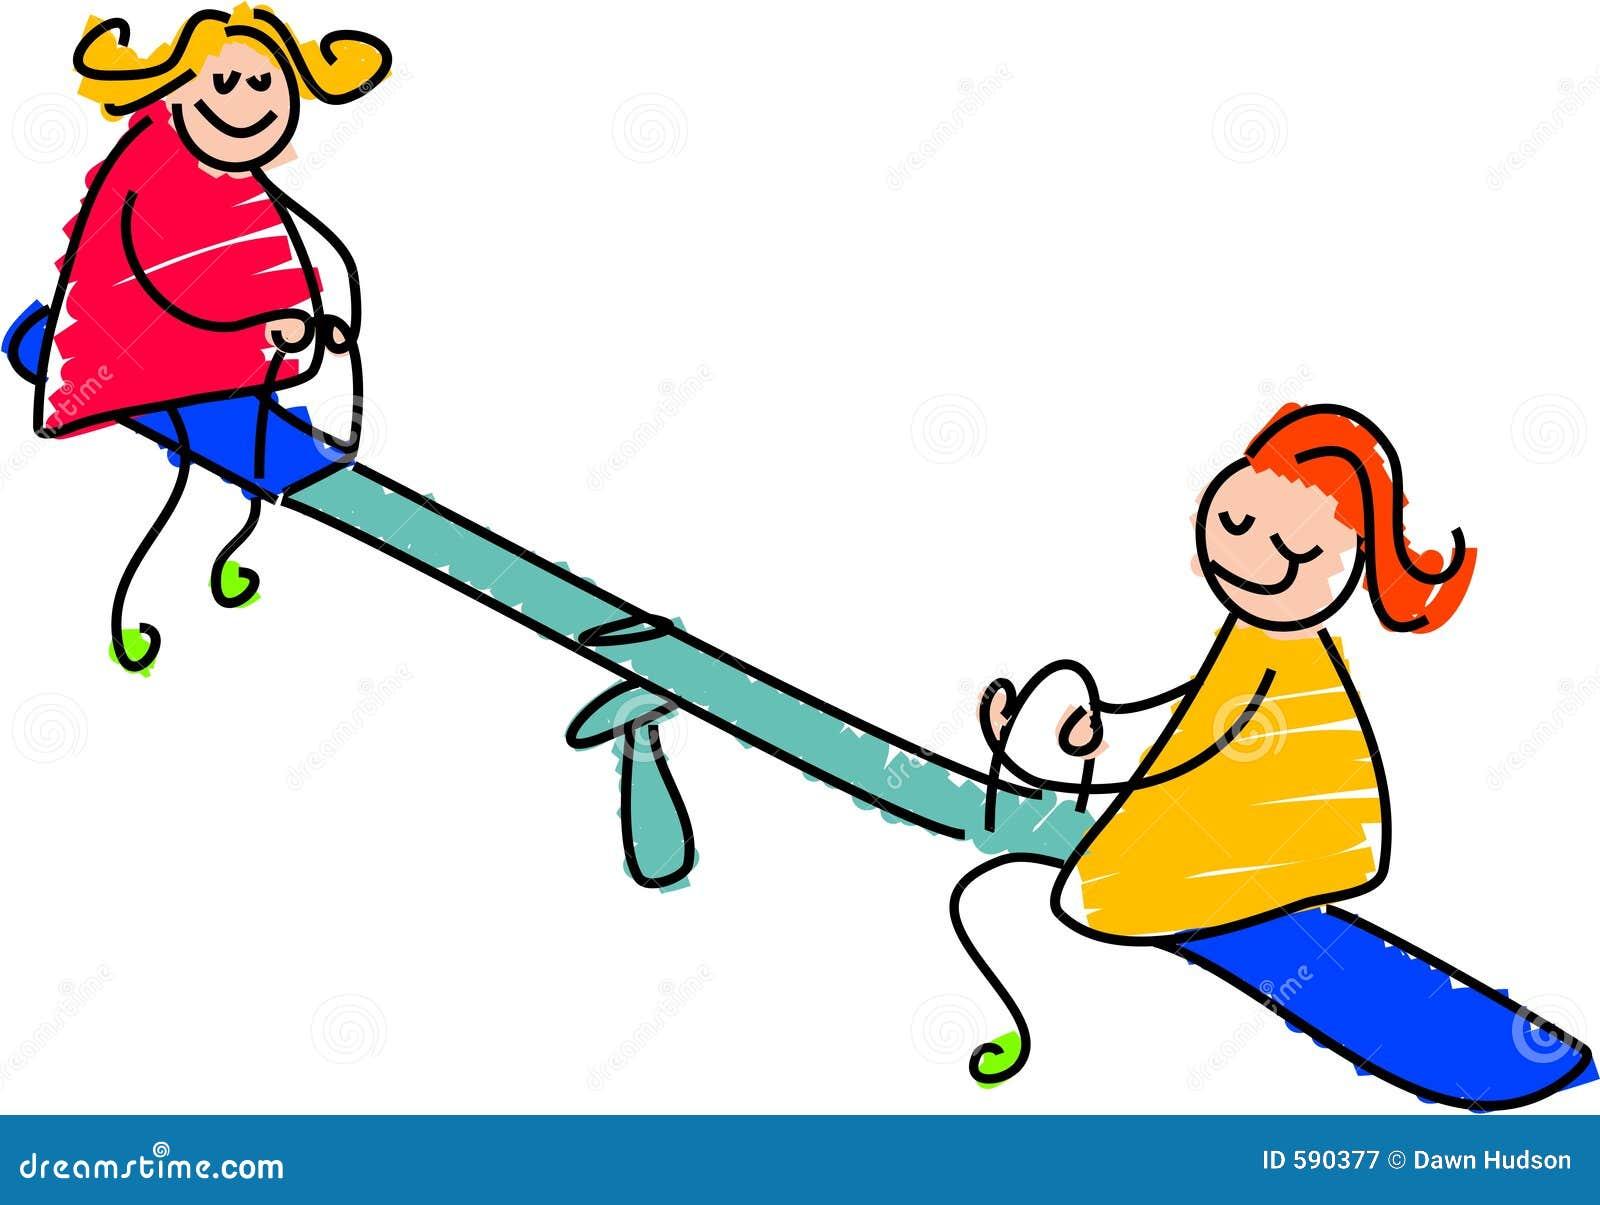 Big Kid Swing Backyard Playground Equipment Costco Tfh